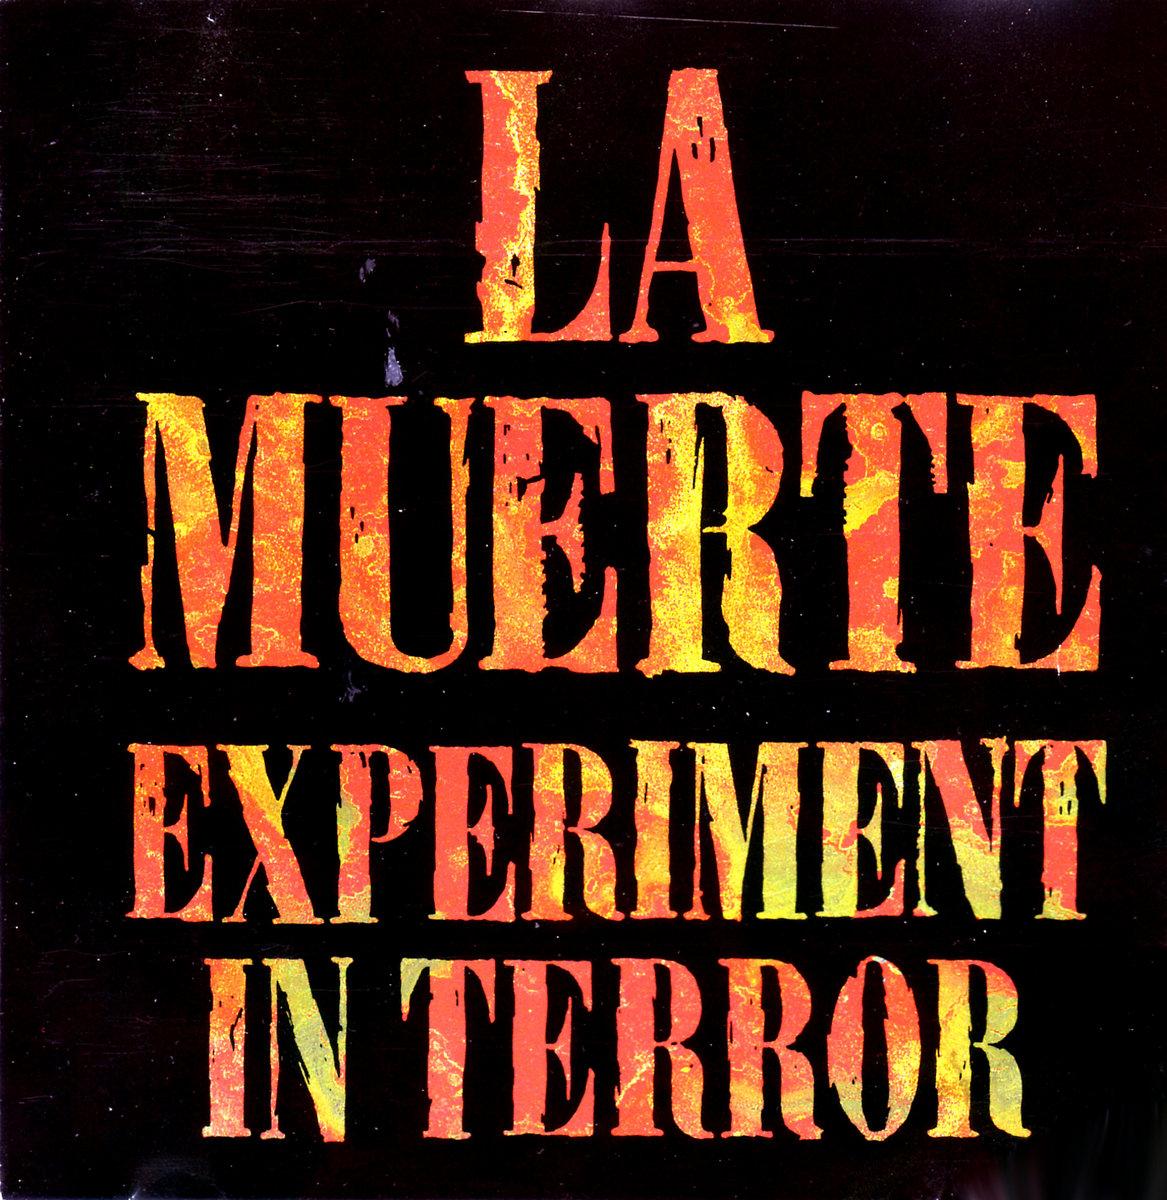 la muerte experiment in terror